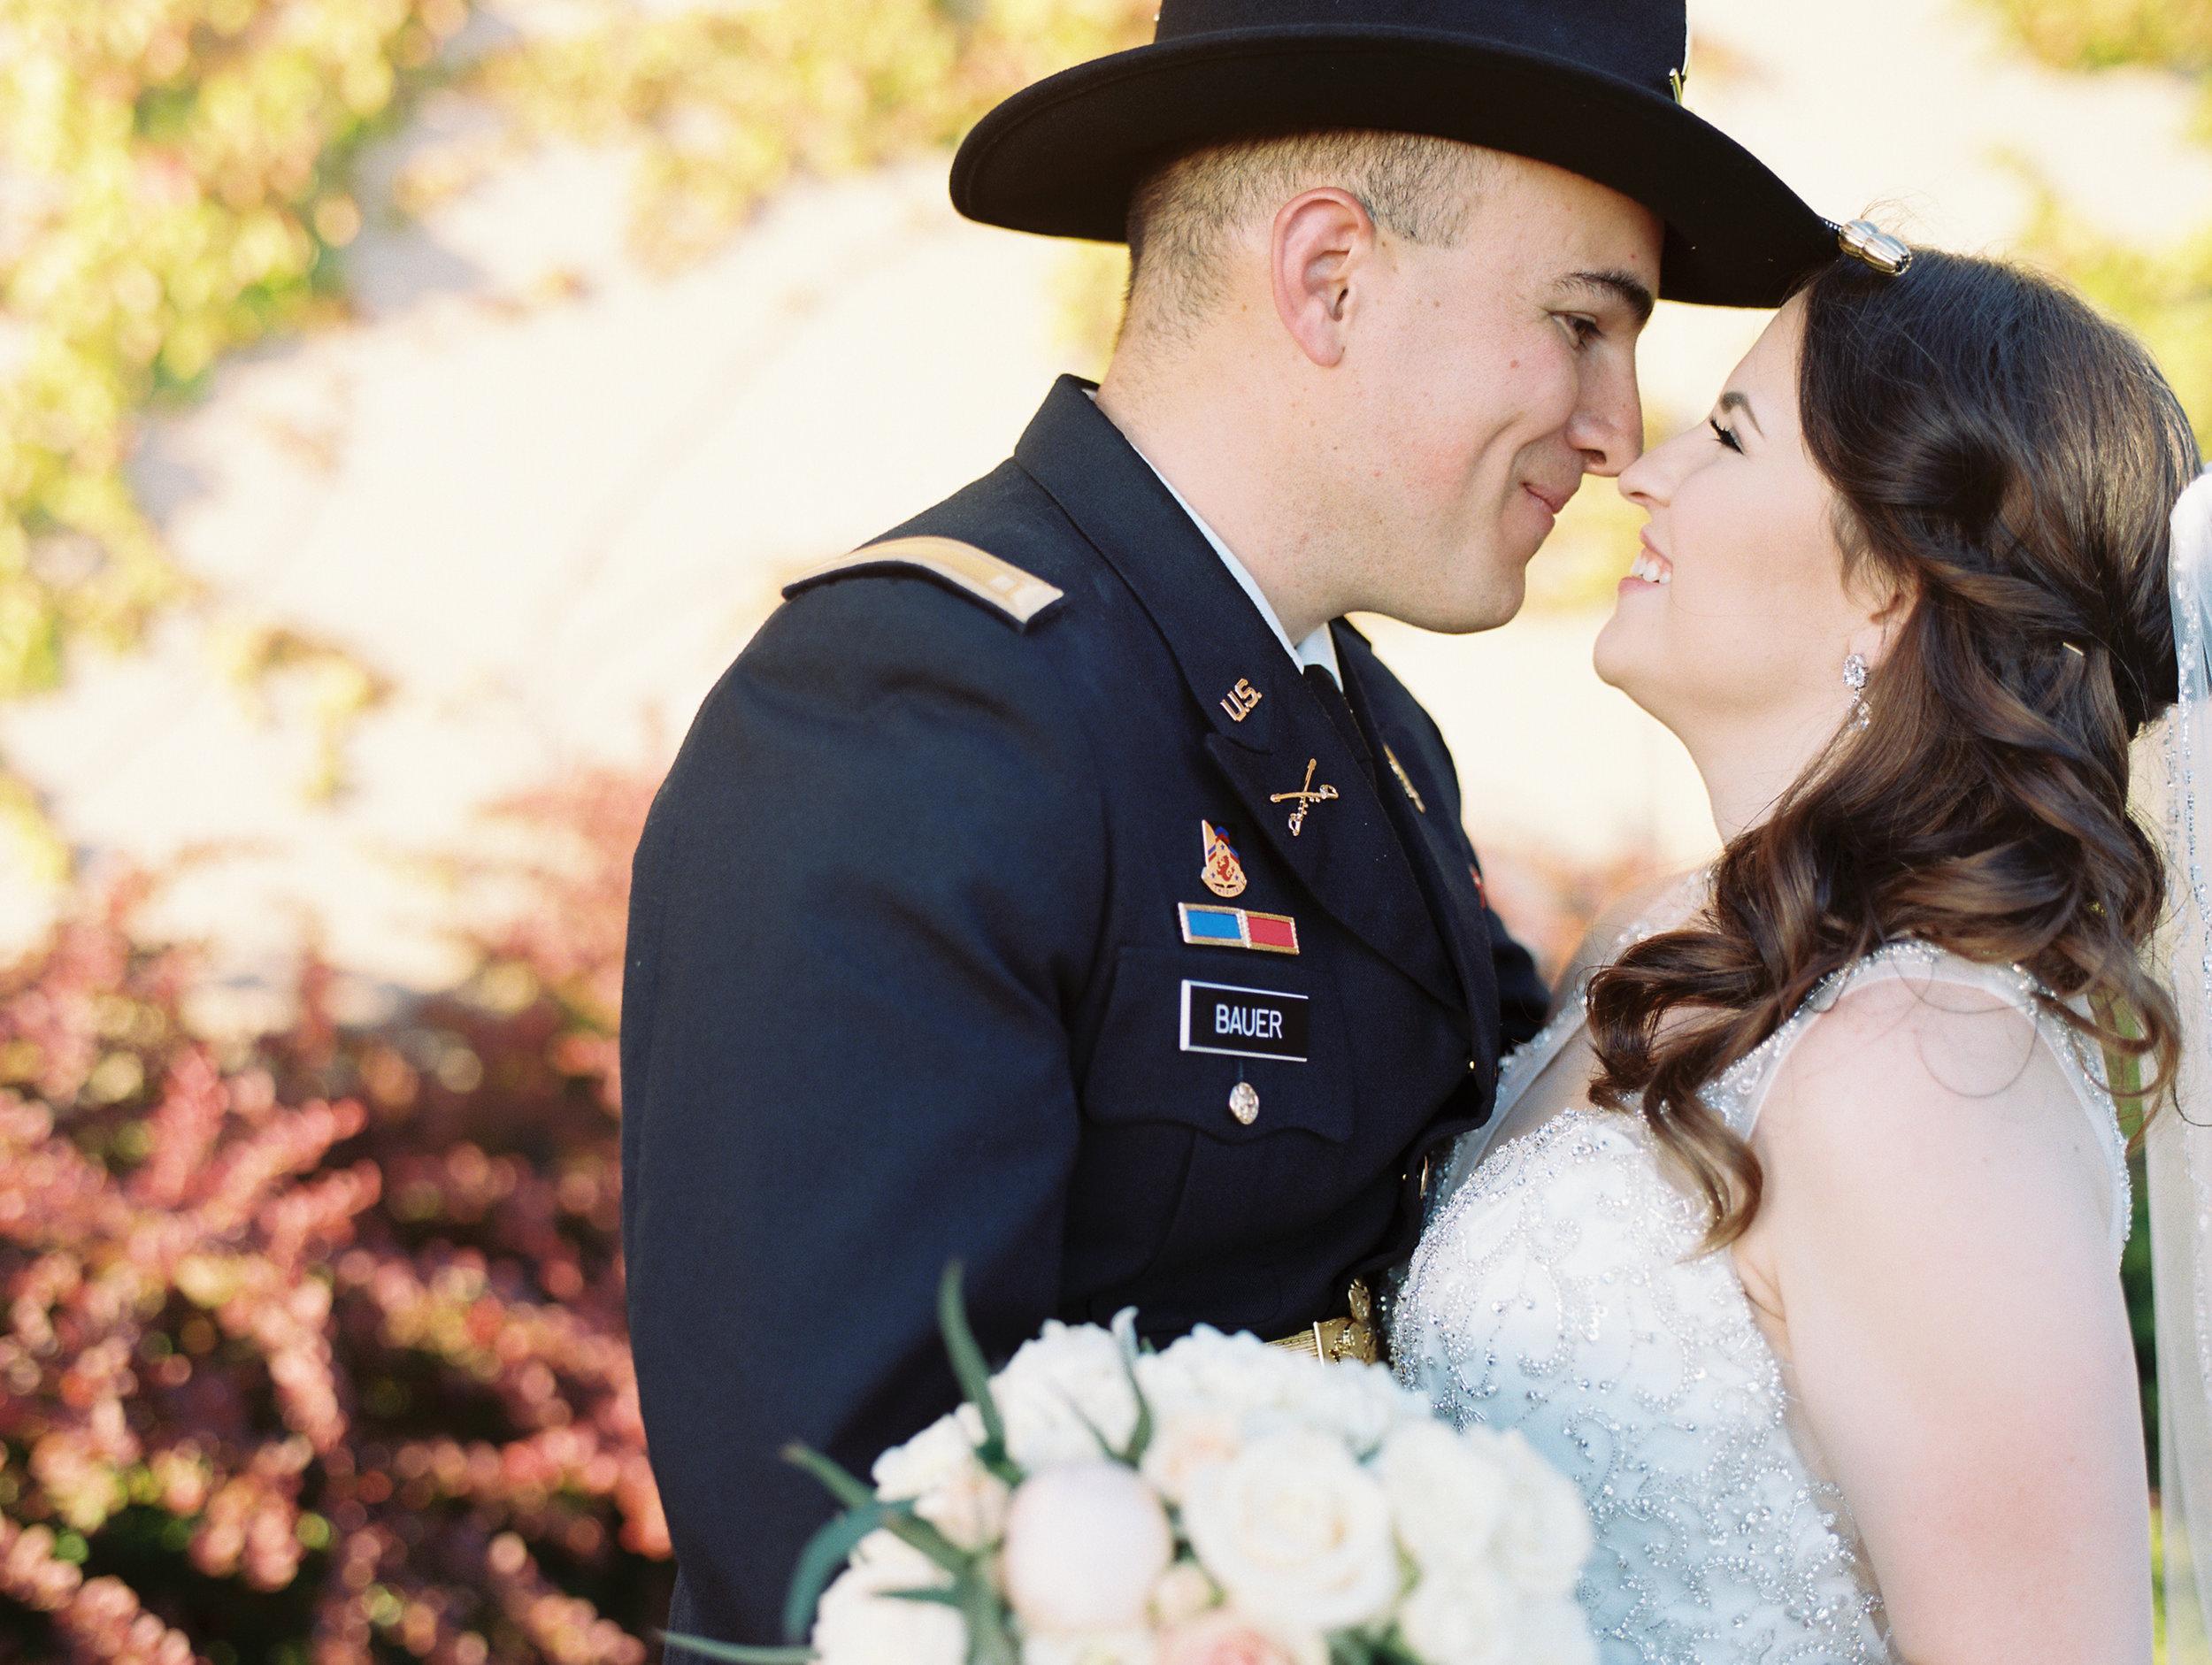 romantic-willamette-valley-vineyards-wedding-photography-45.jpg